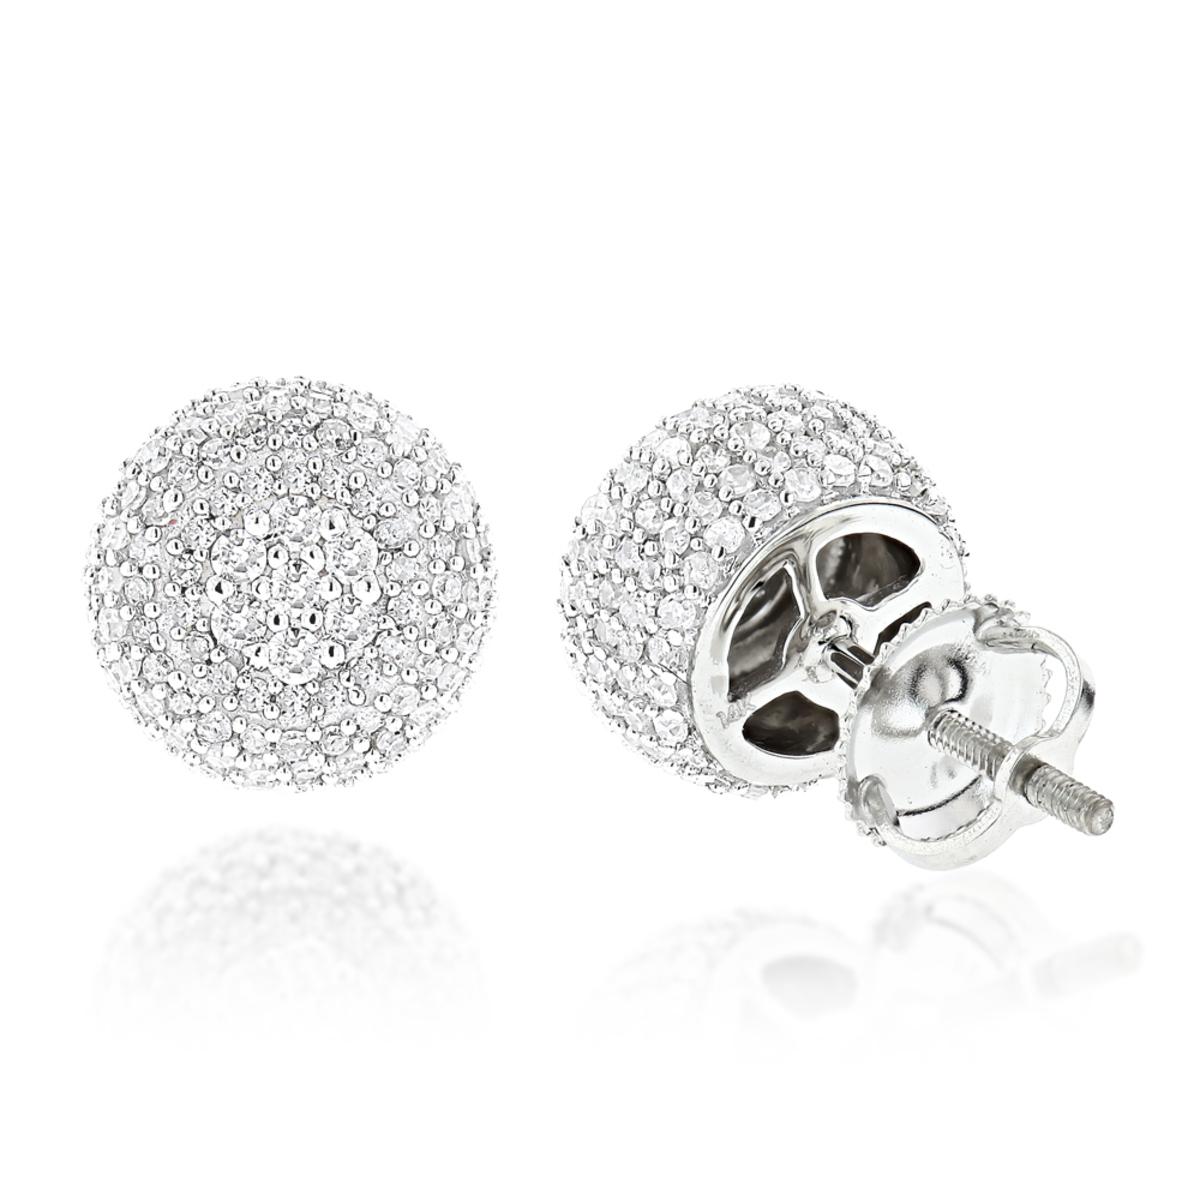 Pave Diamond Earrings 14K Gold Studs 1.32ct